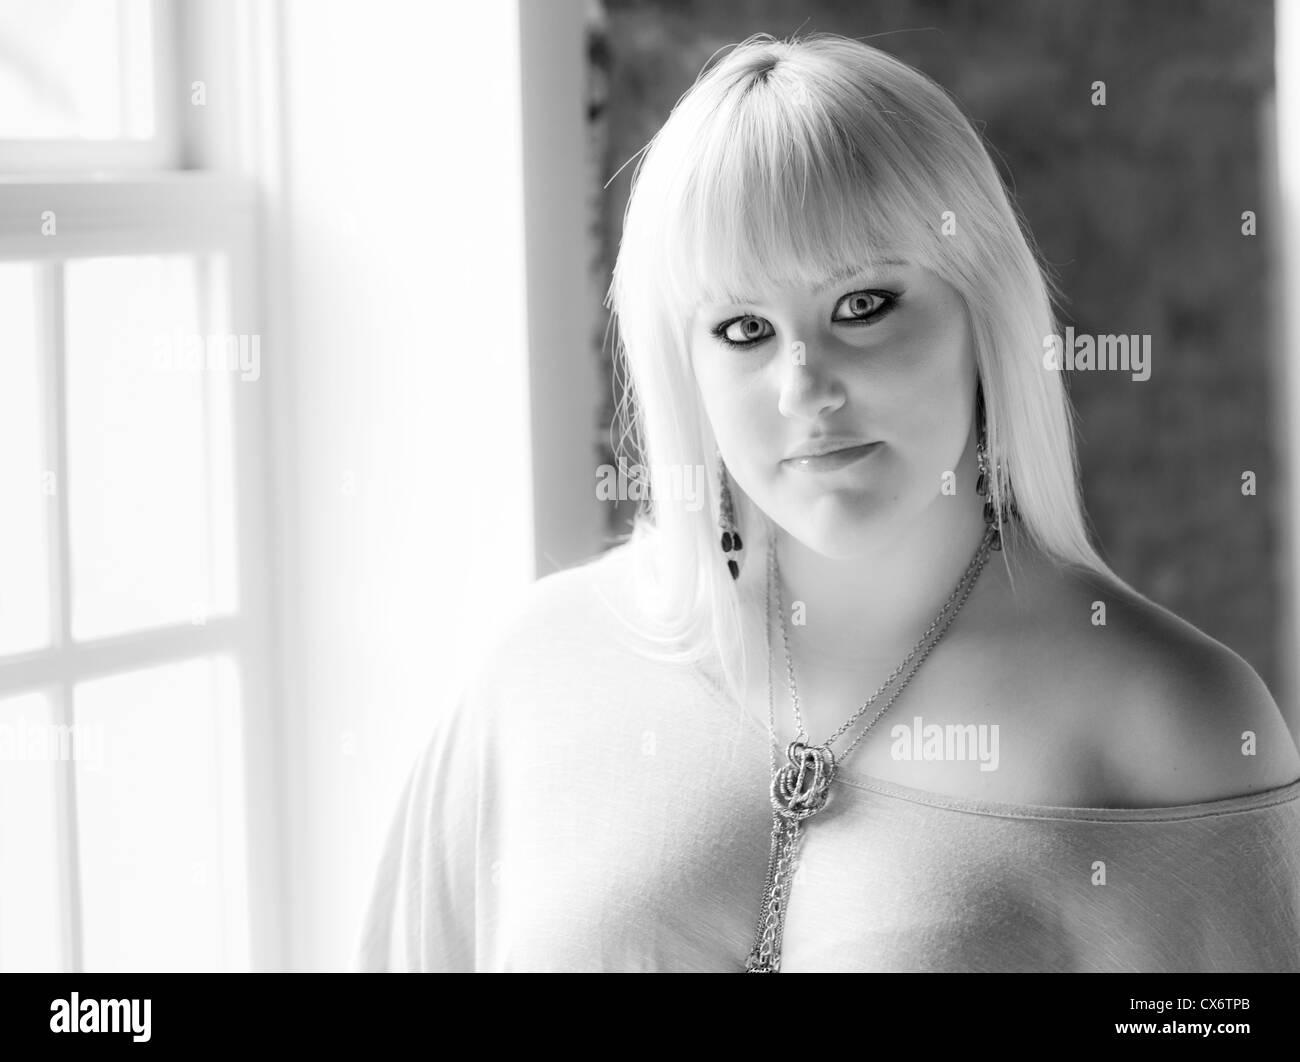 Attraktive junge Frau am Fenster stehen Stockbild